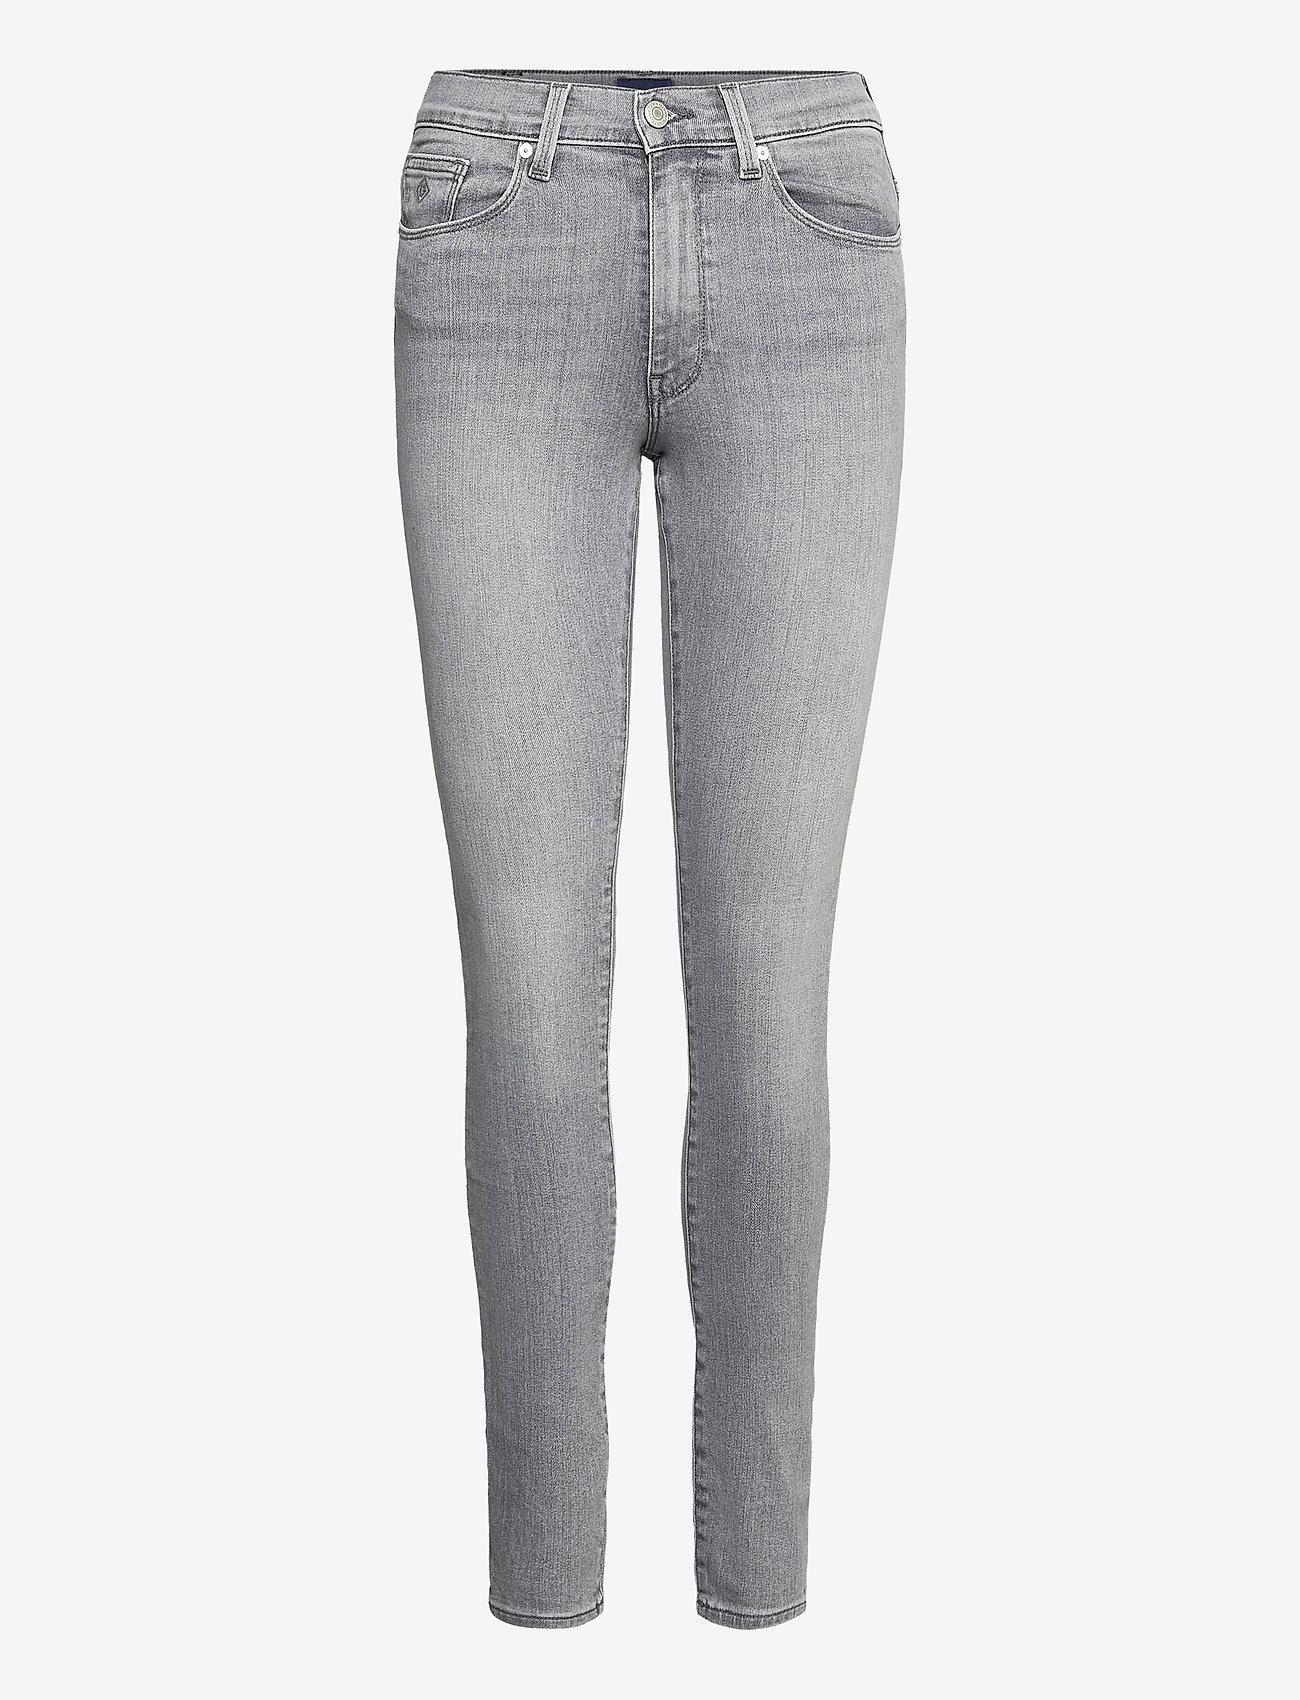 GANT - SKINNY SUPER STRETCH JEANS - skinny jeans - grey worn in - 0